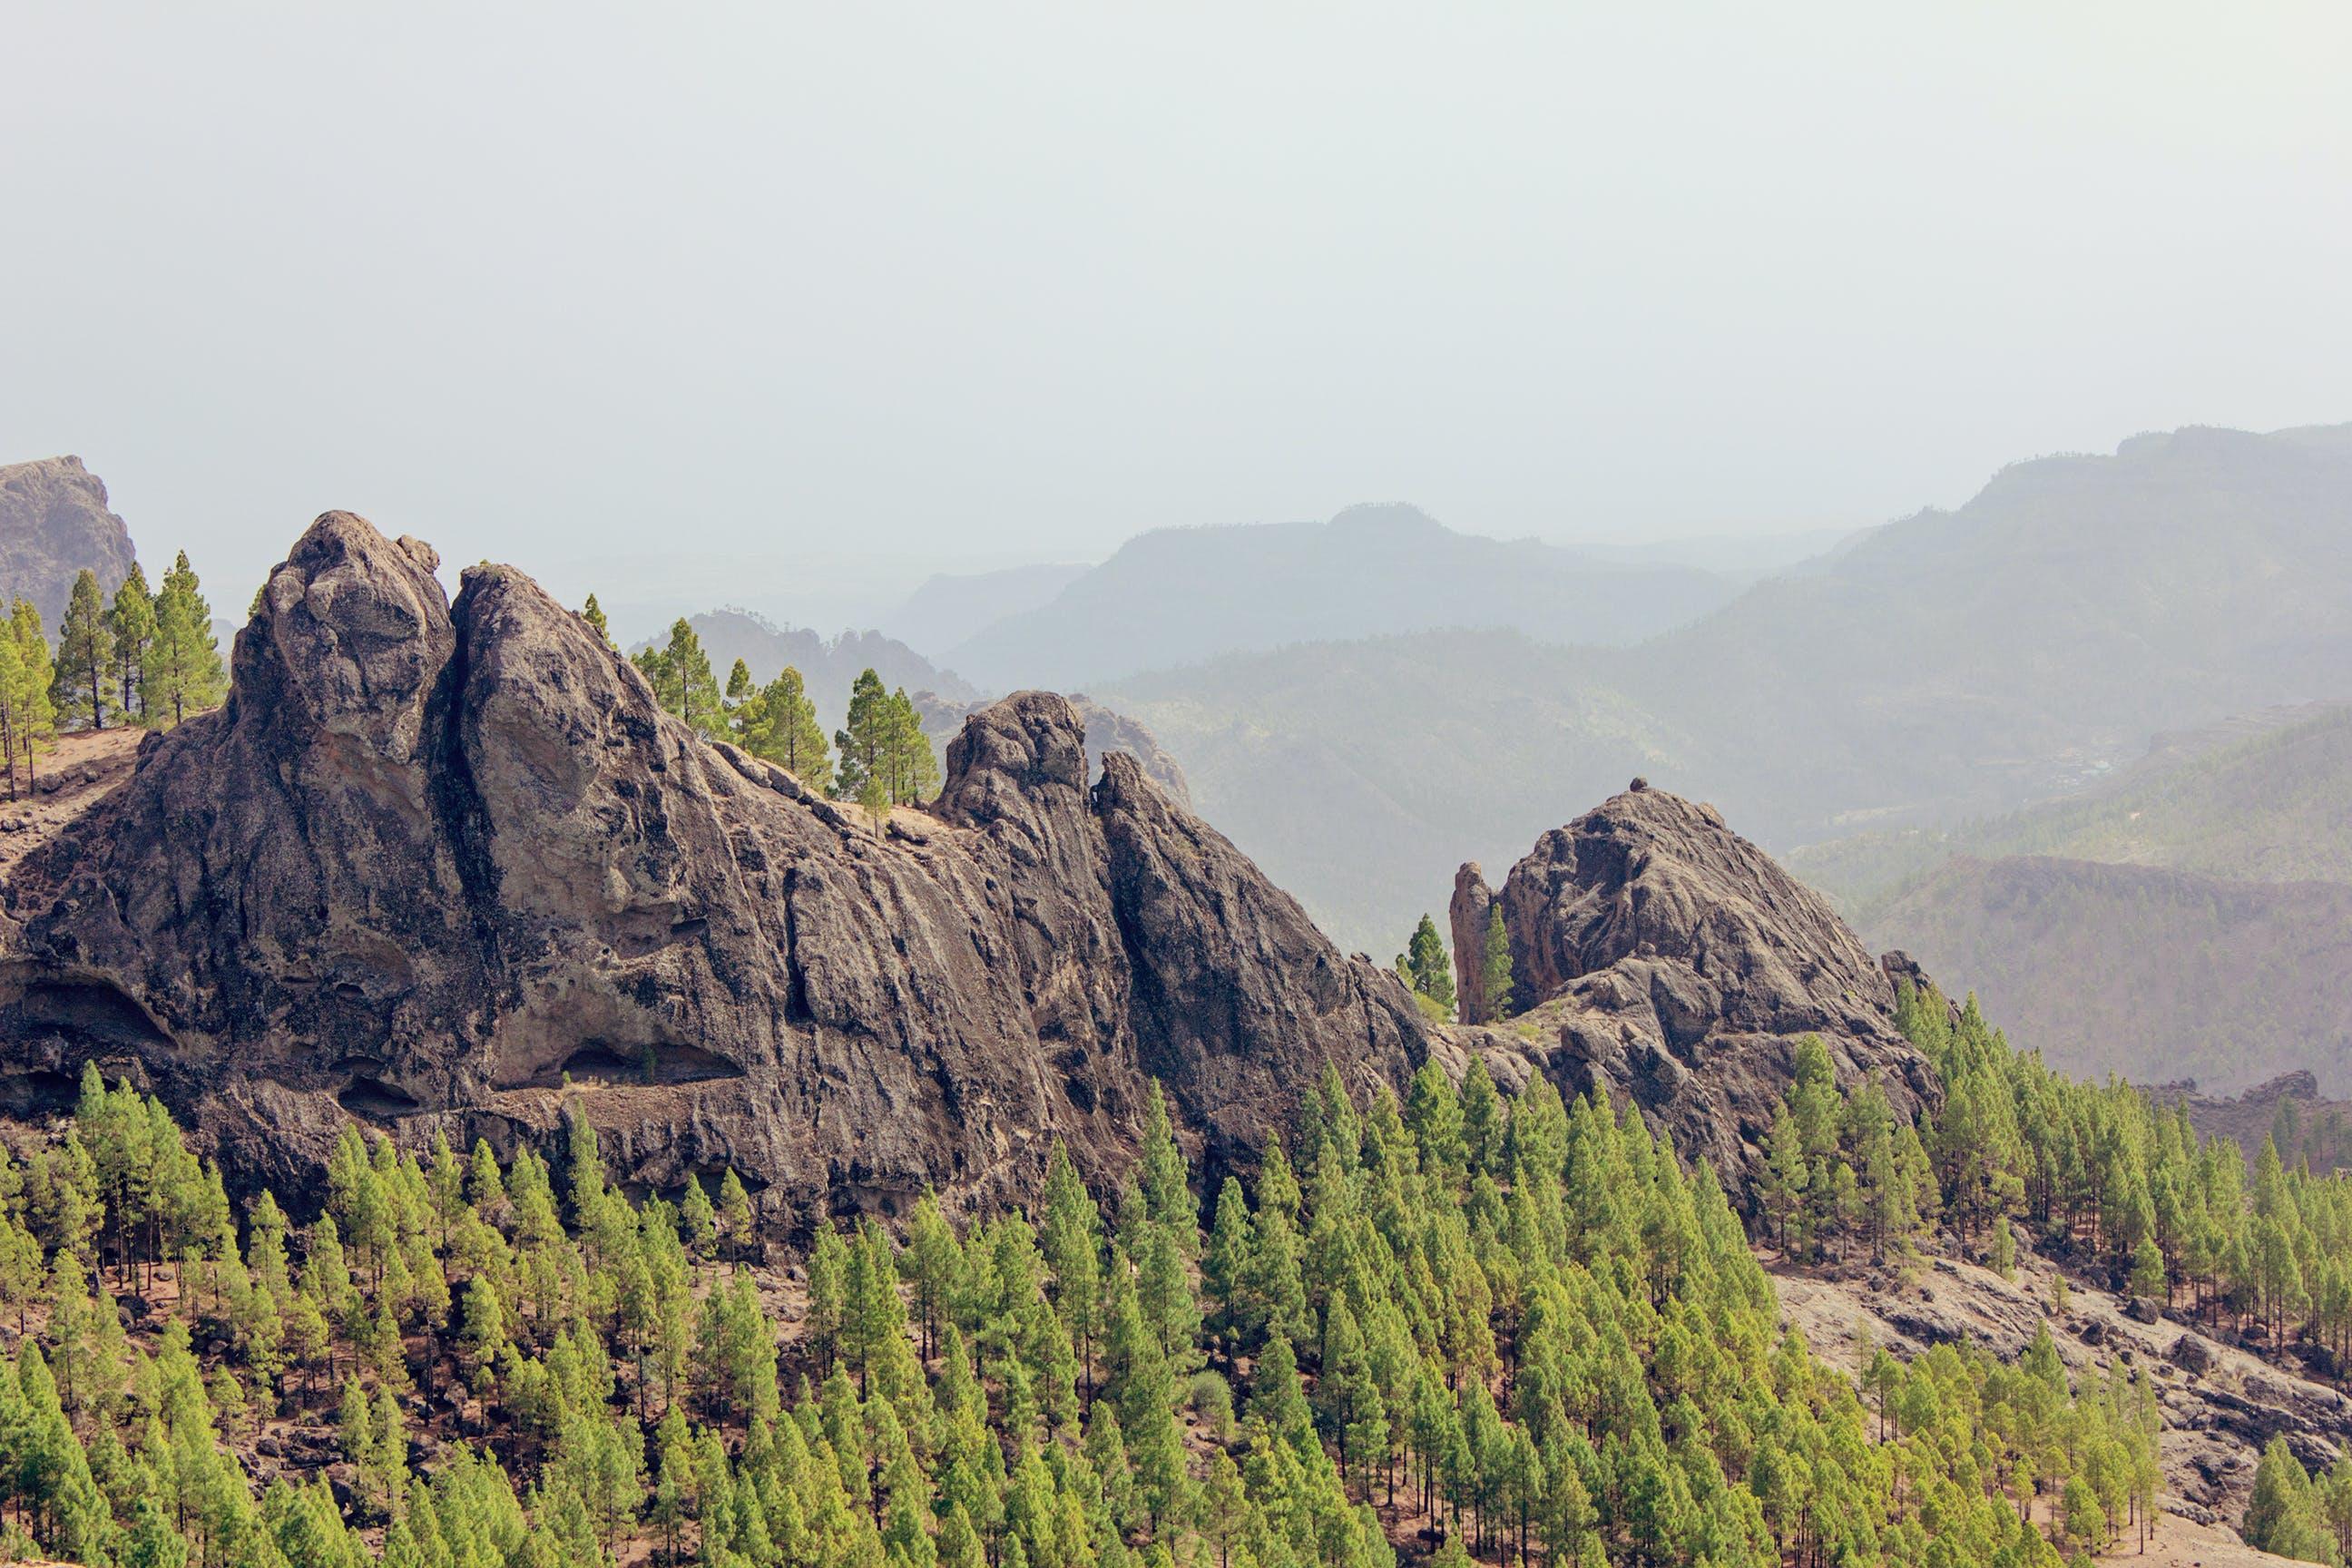 Kostenloses Stock Foto zu bäume, berge, felsen, felswand